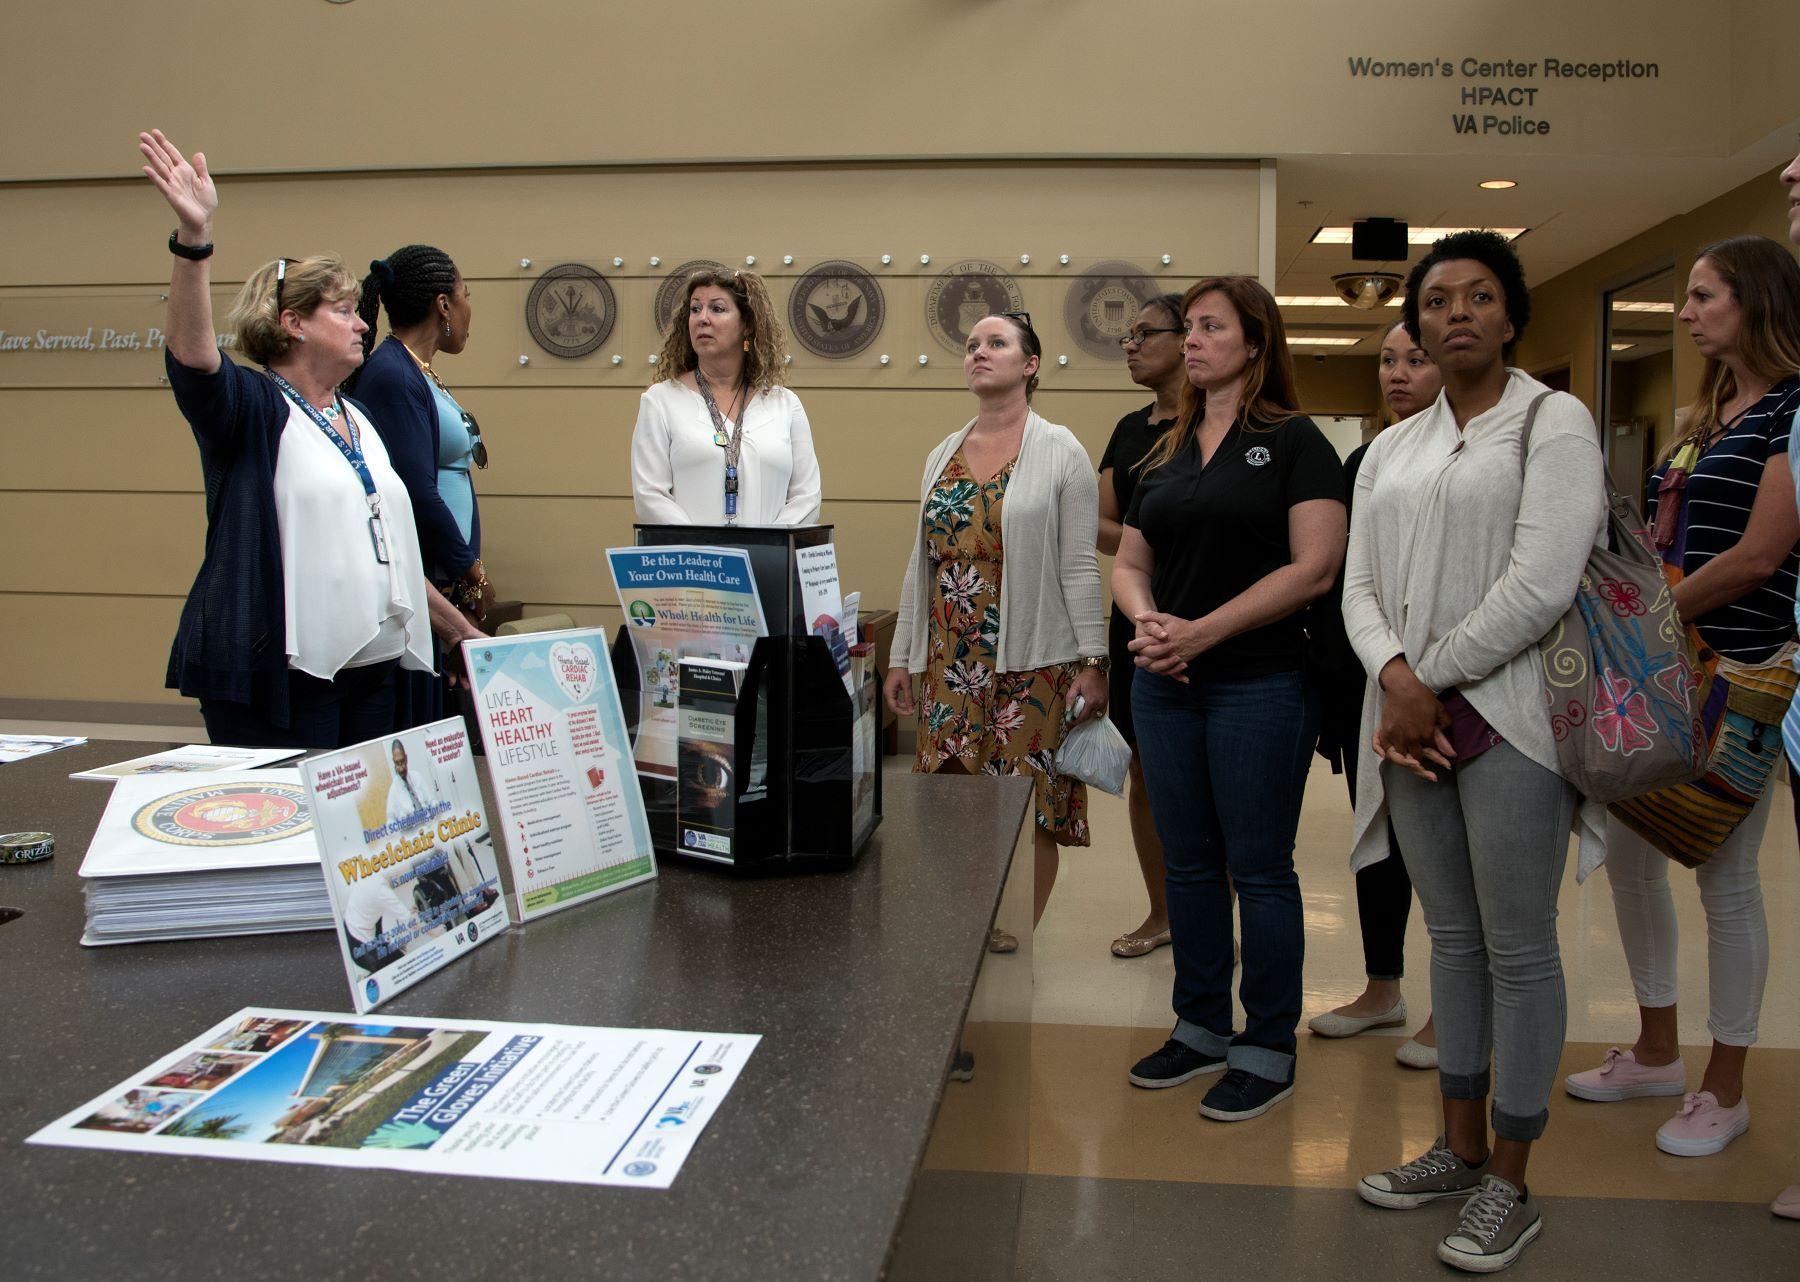 VA Struggles to Curb Harassment of Female Veterans at